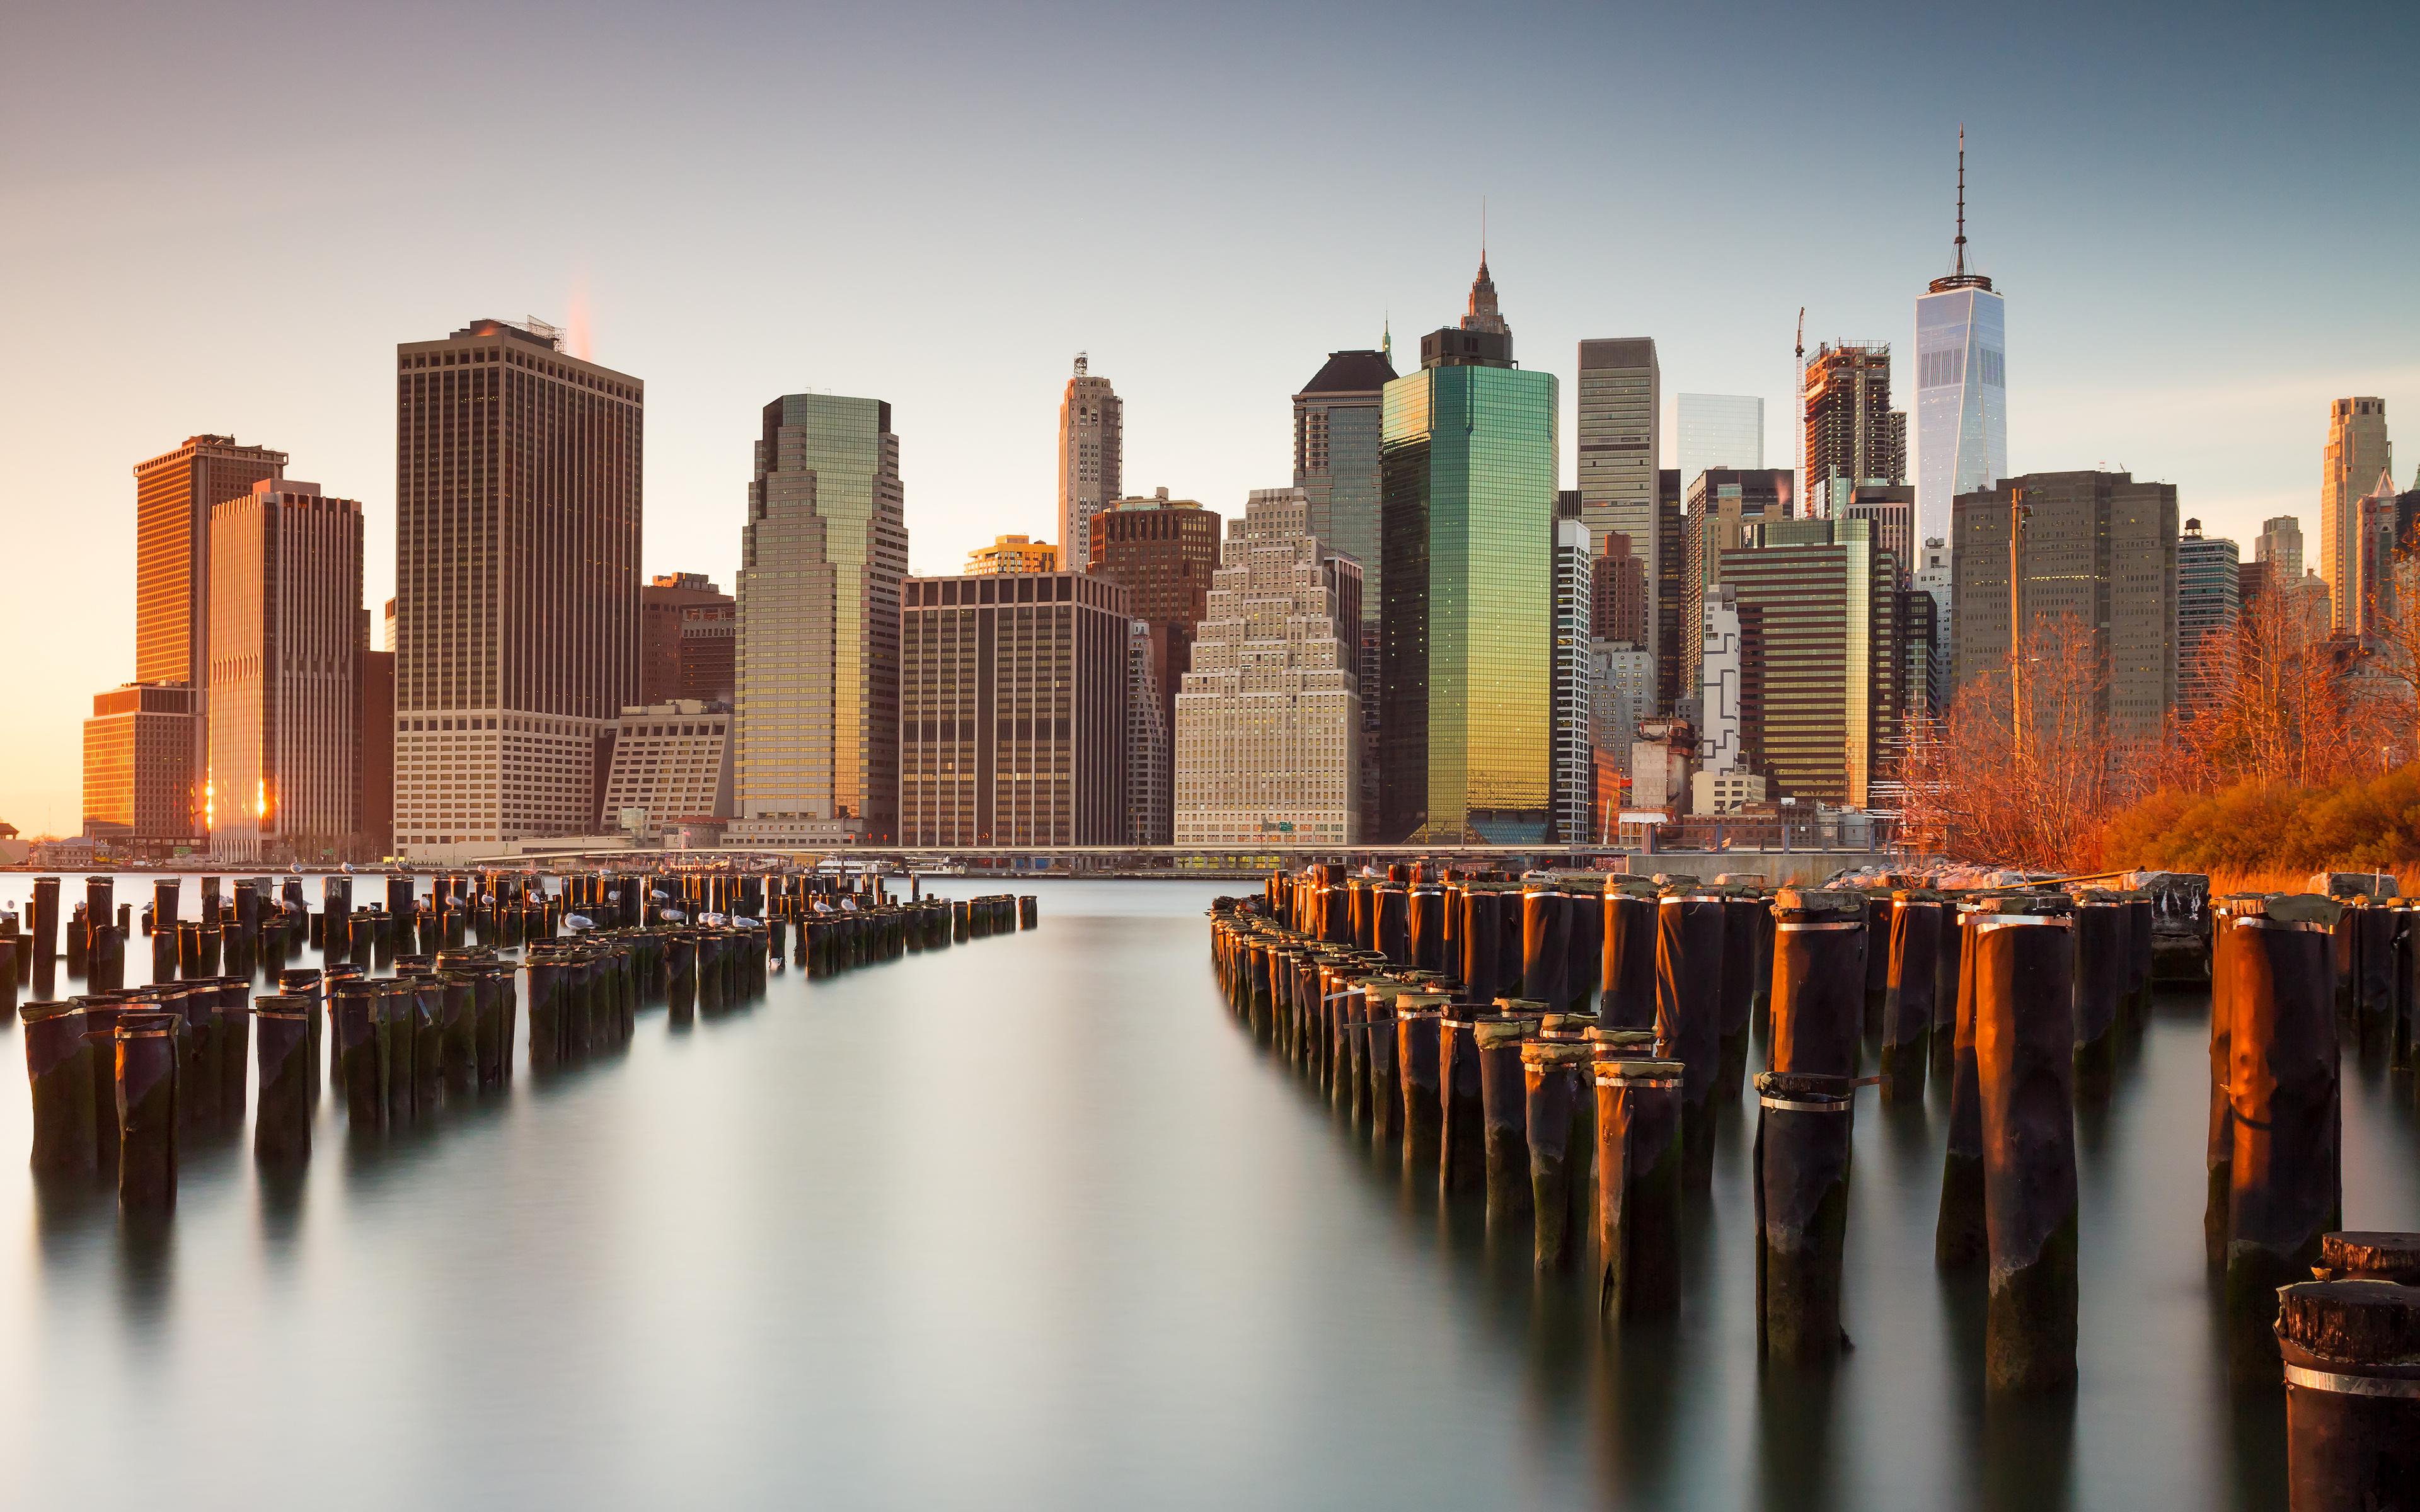 new york city skyline skyscrapers cityscape sunset evening 3840x2400 35